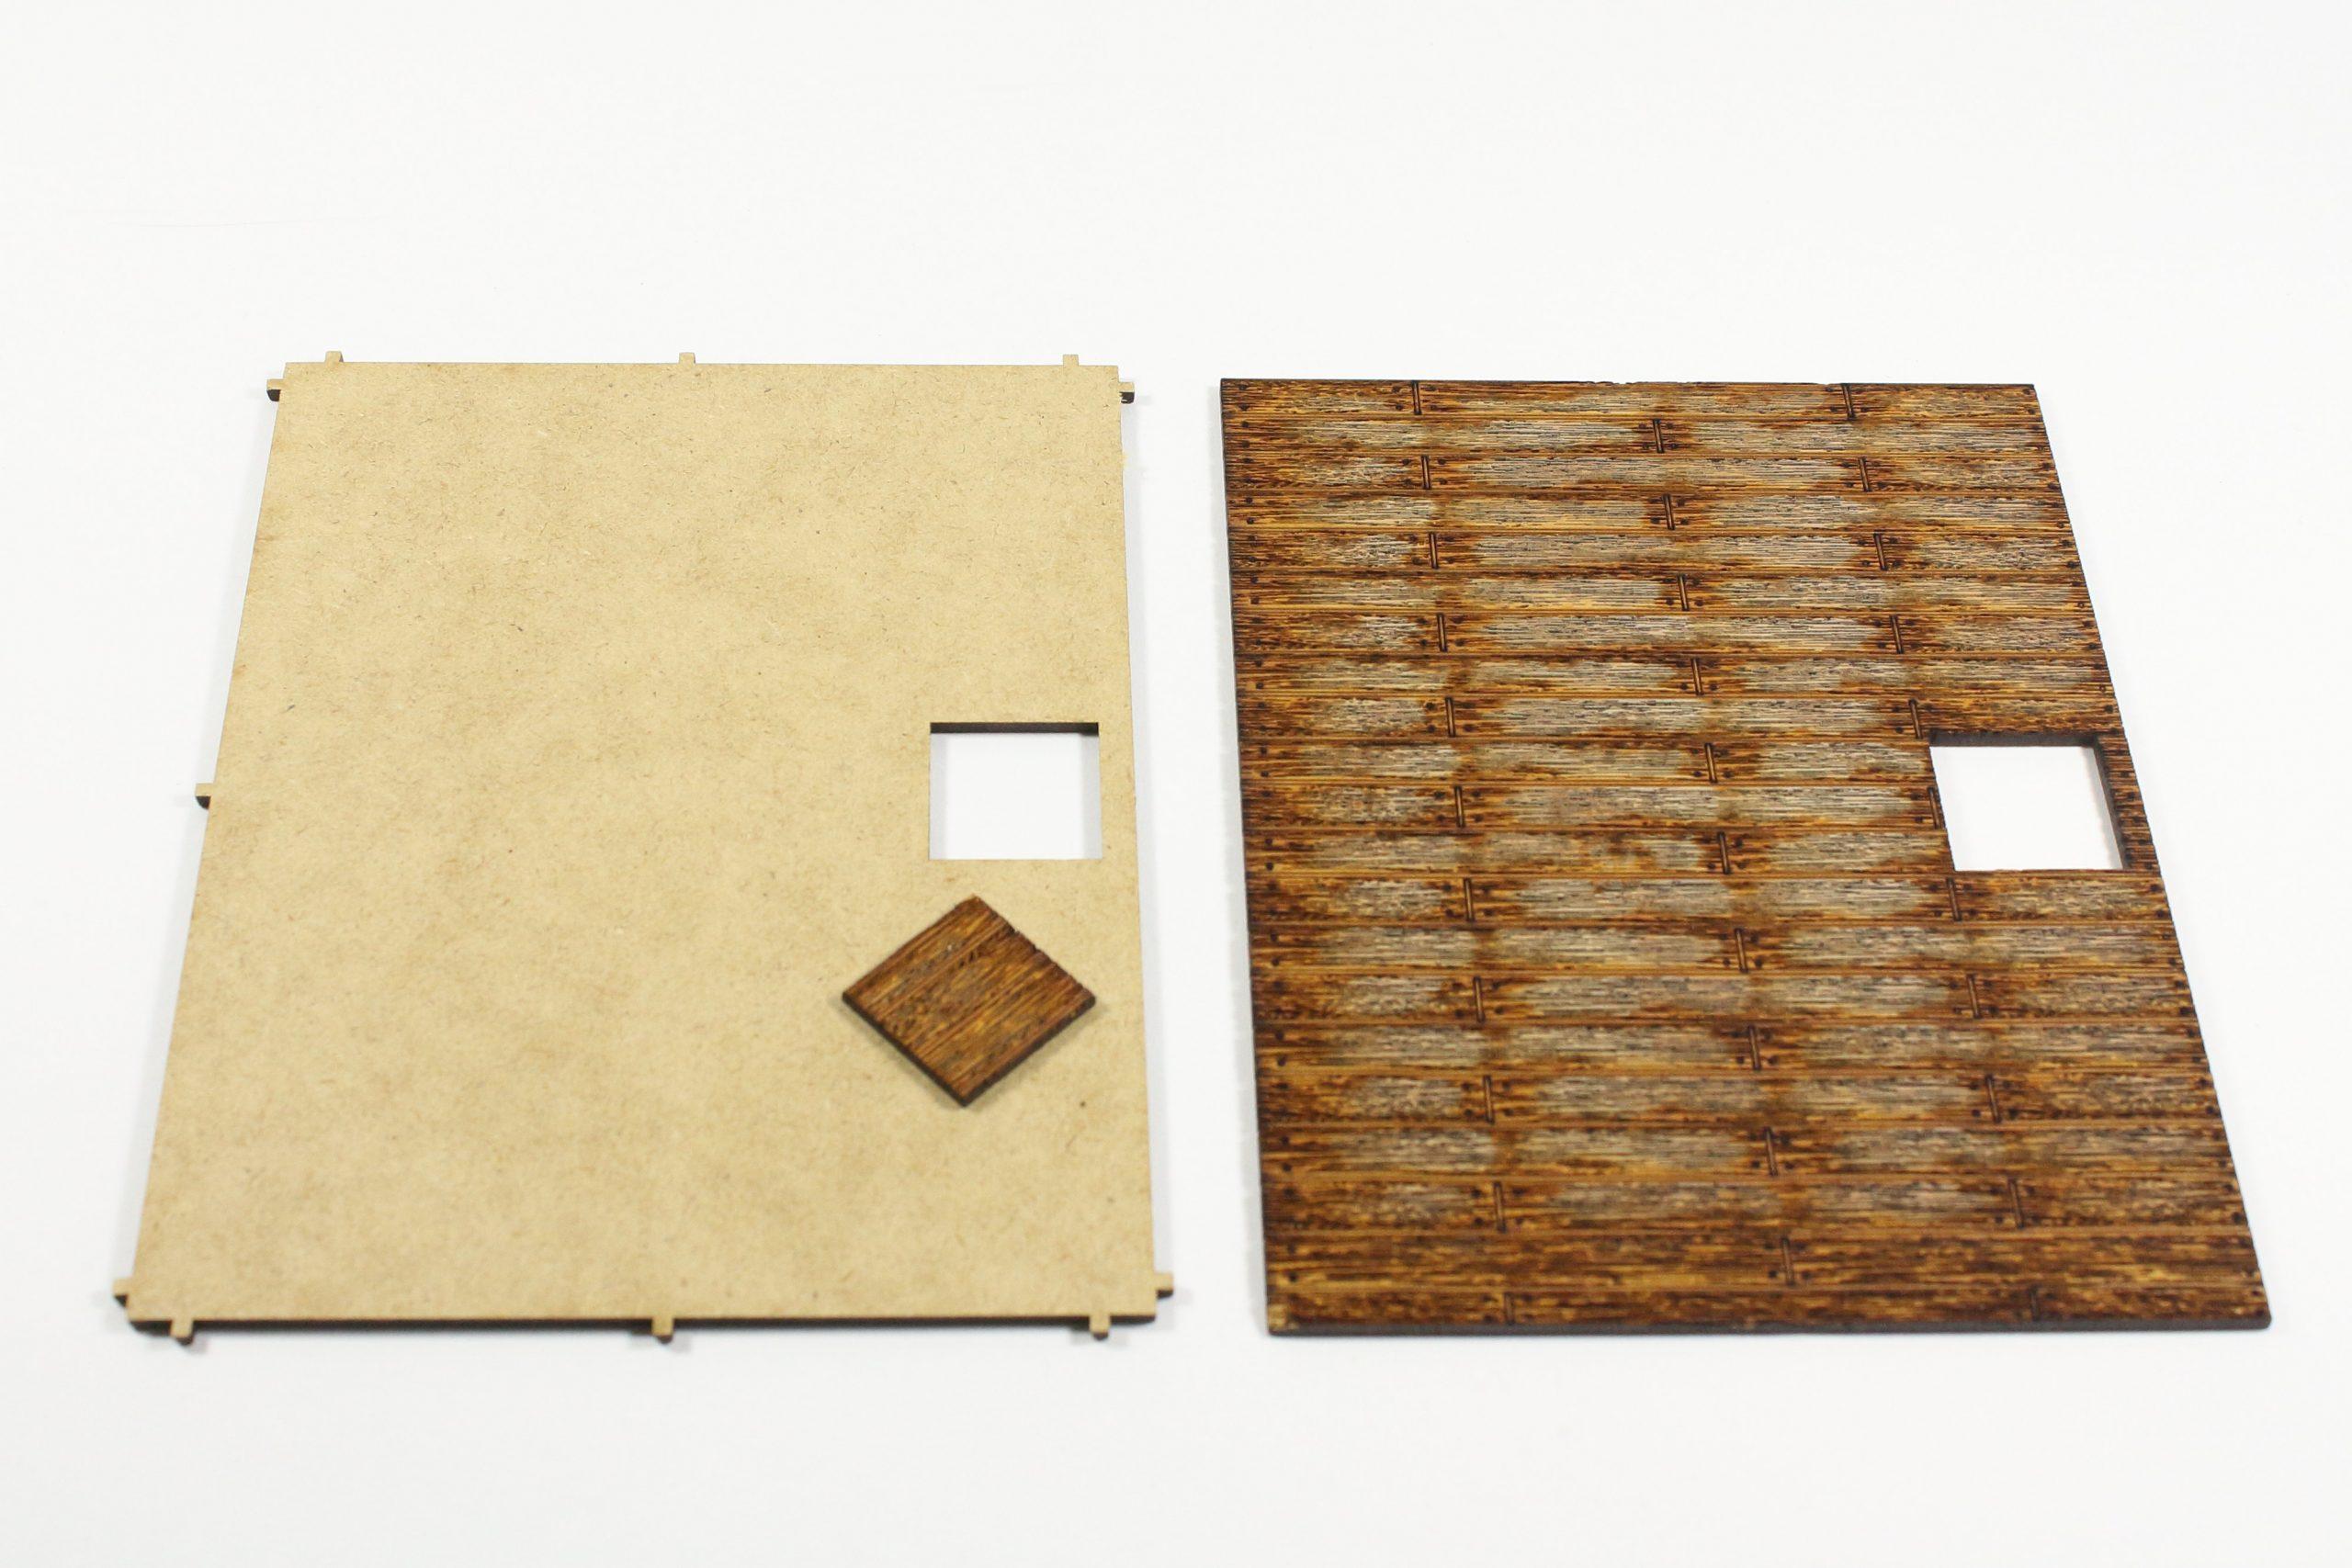 Bild-5-scaled Fachwerkhaus mit Holzschuppen - Lasercut Modellbaushop 1:35